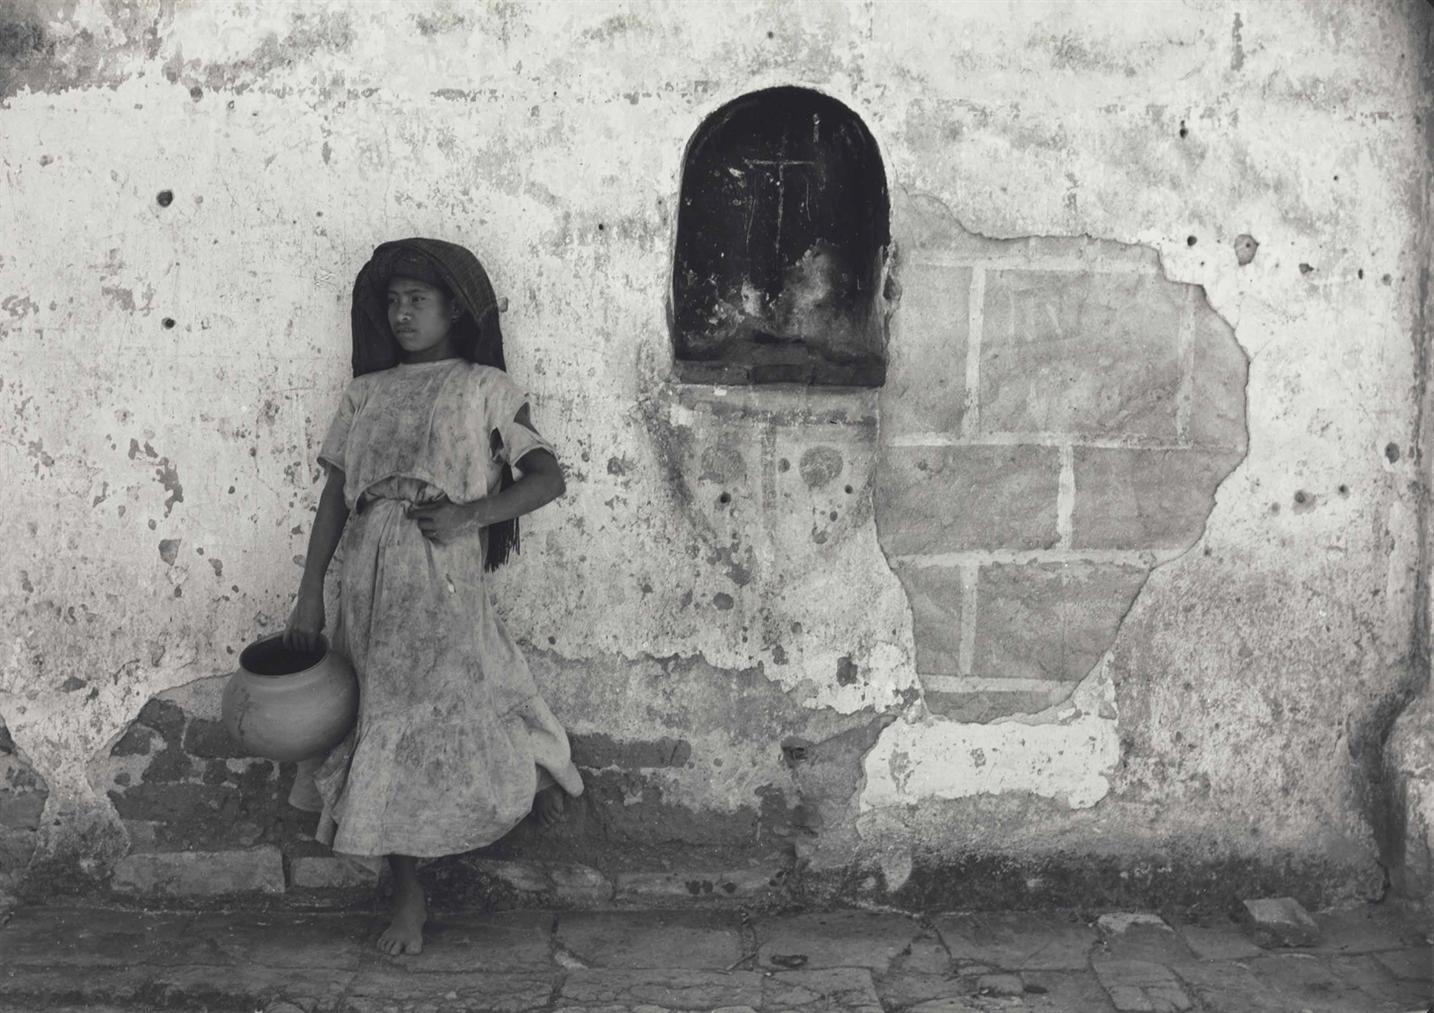 Manuel Alvarez Bravo-Recuerdo De Atzompan (Remembrance From Atzompan)-1943